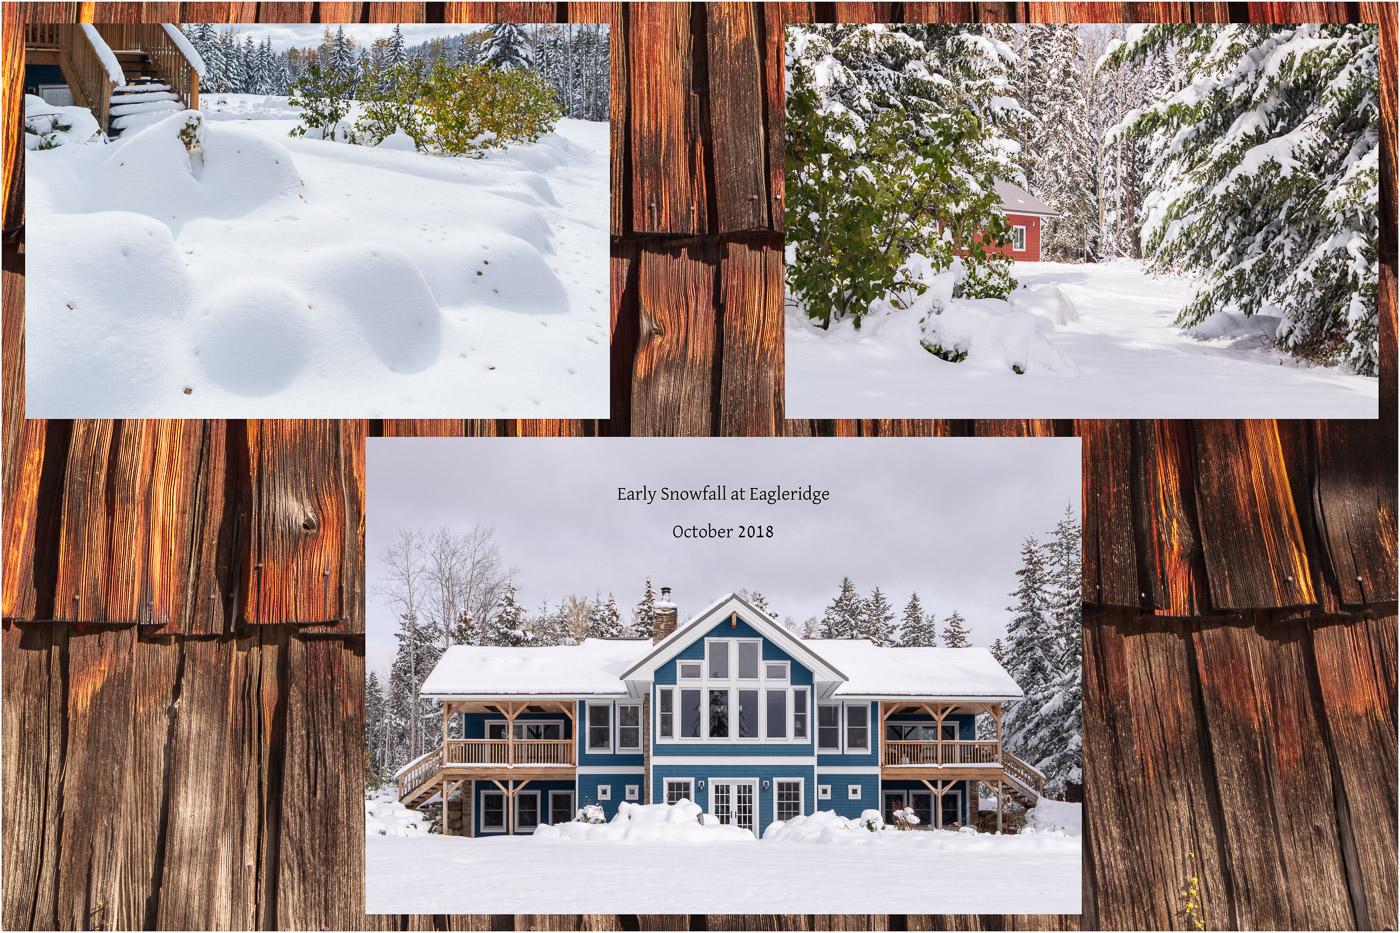 Eagleridge Collage - © Sharon Jensen